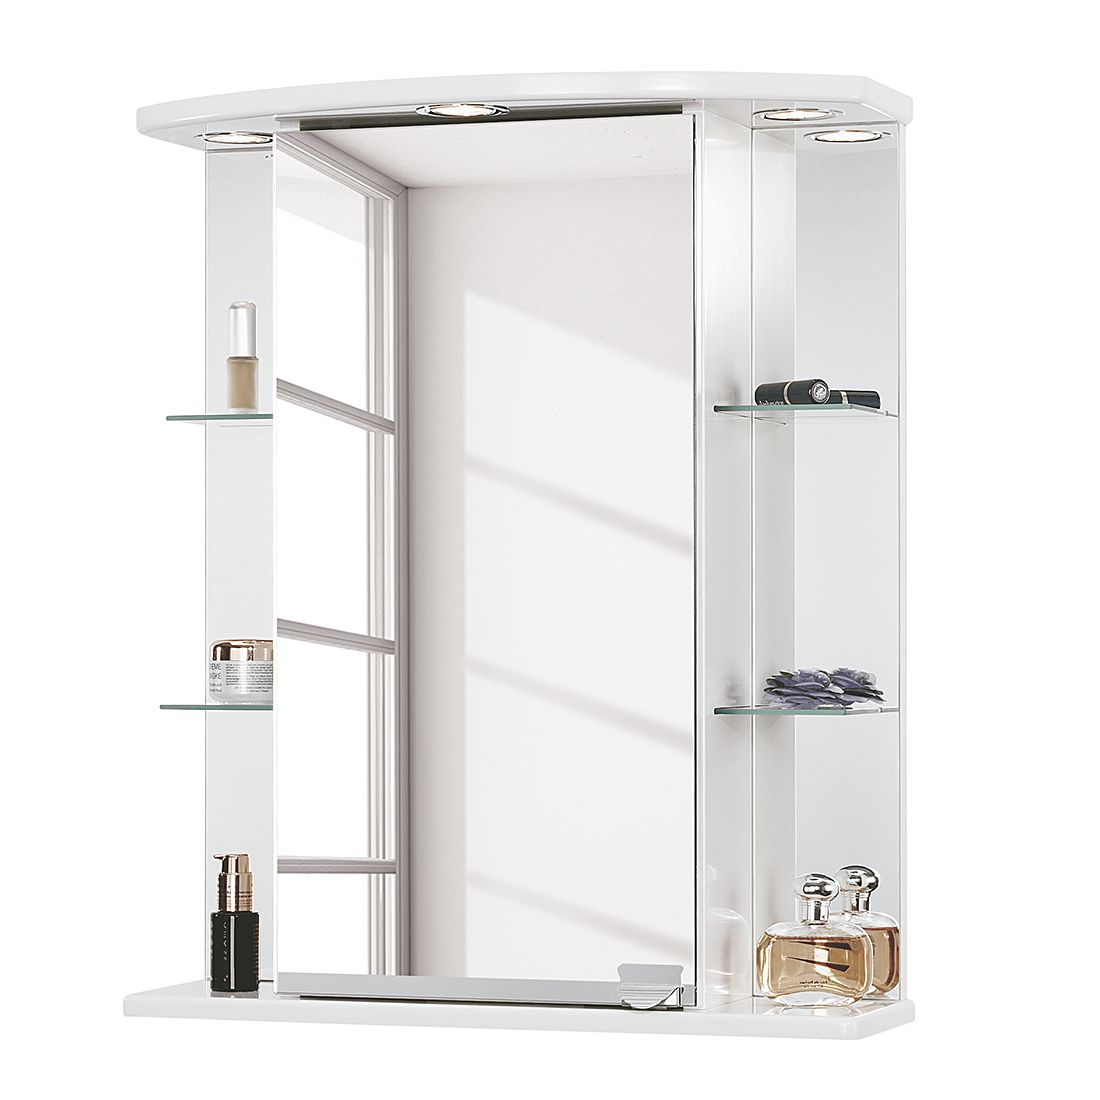 spiegelschrank havana badezimmer 2016. Black Bedroom Furniture Sets. Home Design Ideas